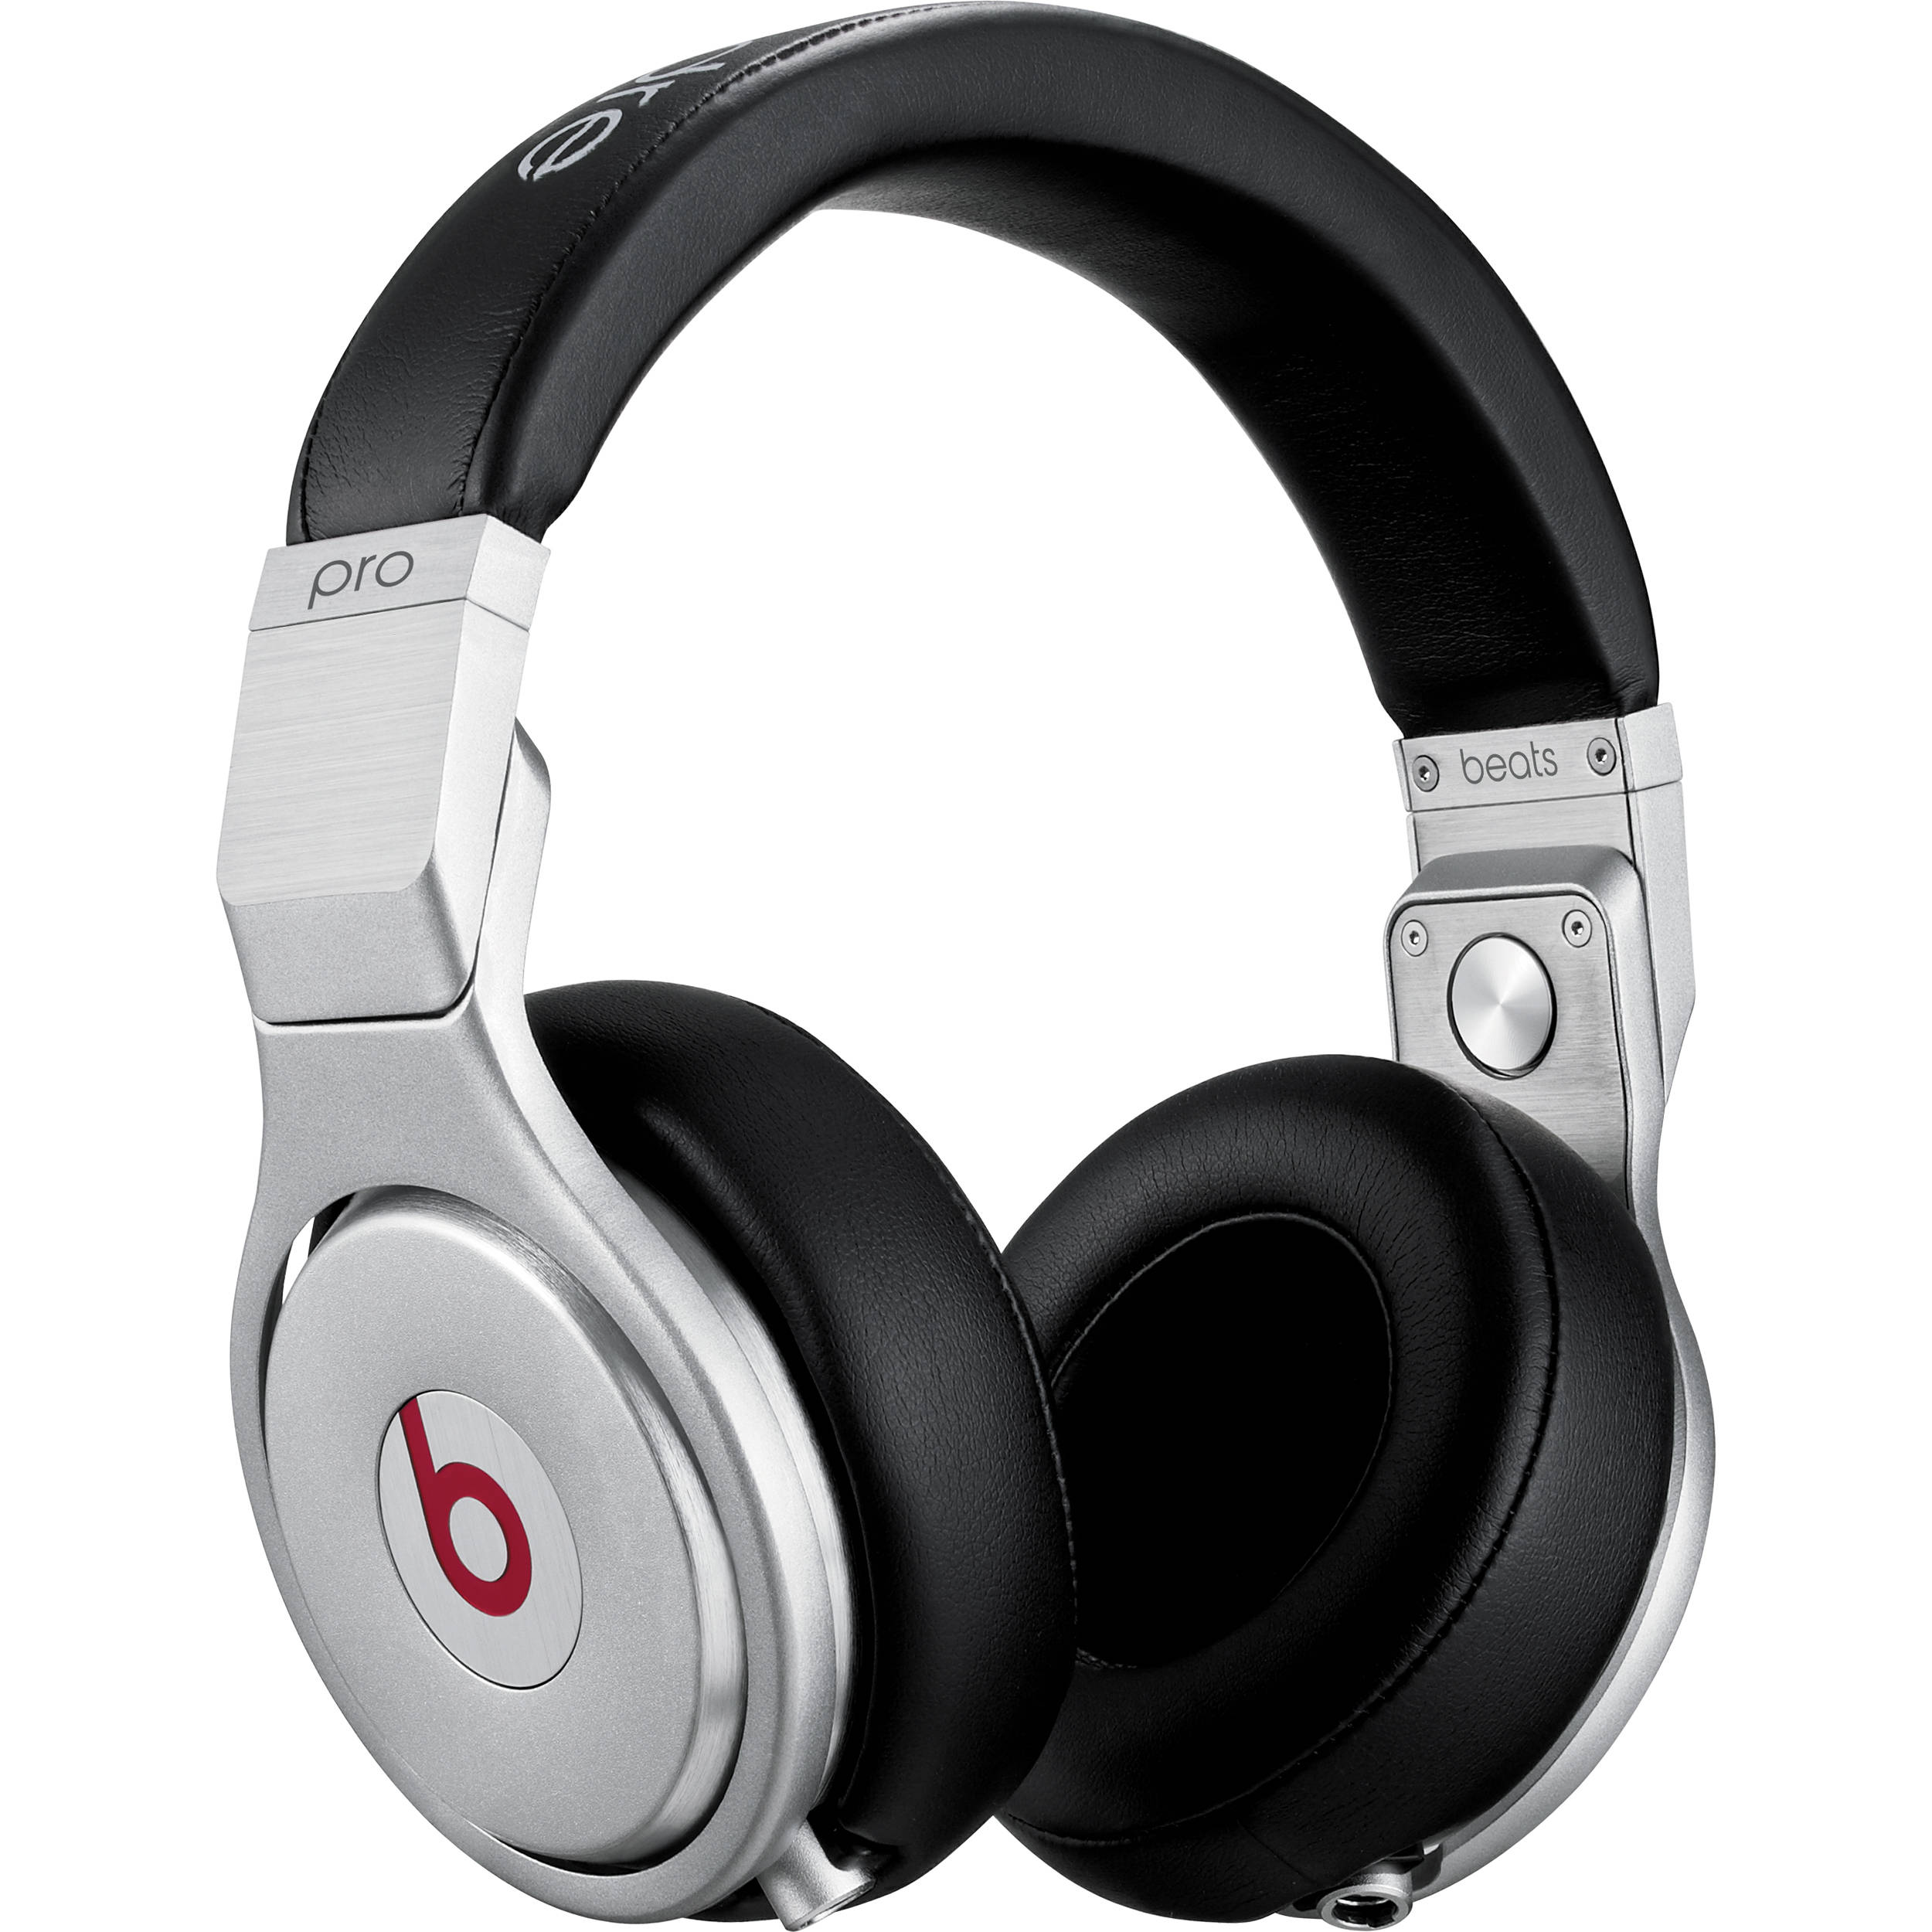 20a98b93d Beats by Dr. Dre Pro - High-Performance Studio Headphones (Black)